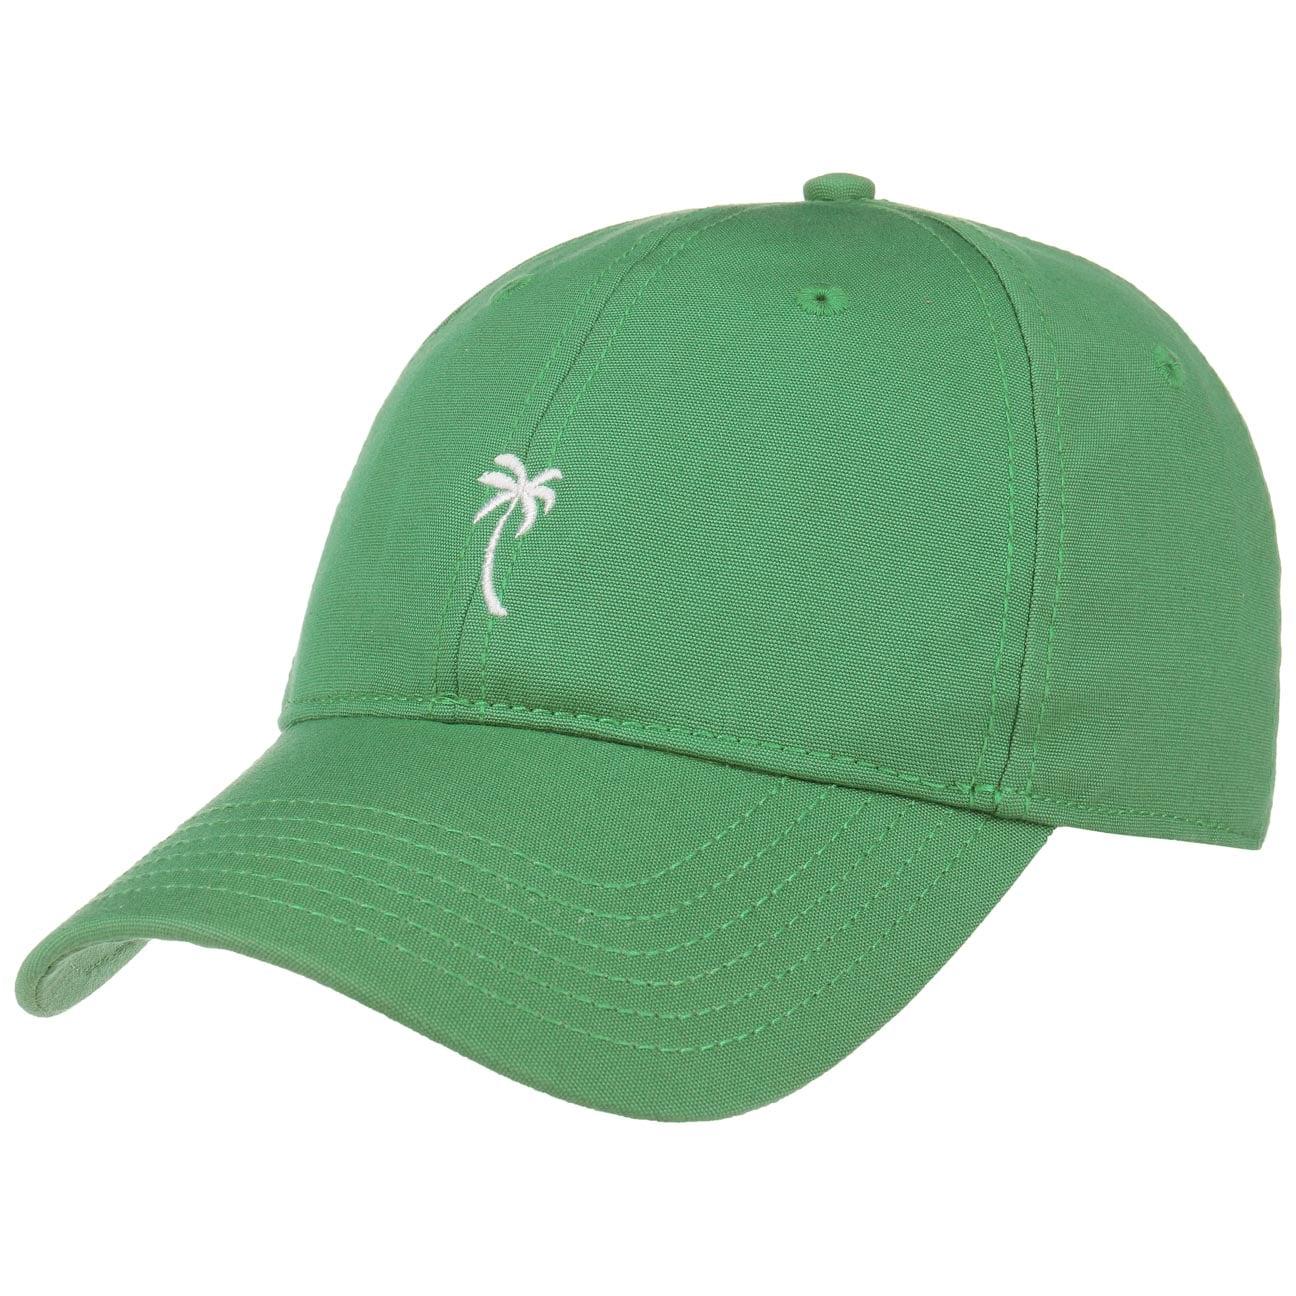 Casquette Strapback Palm by dedicated  casquette en coton